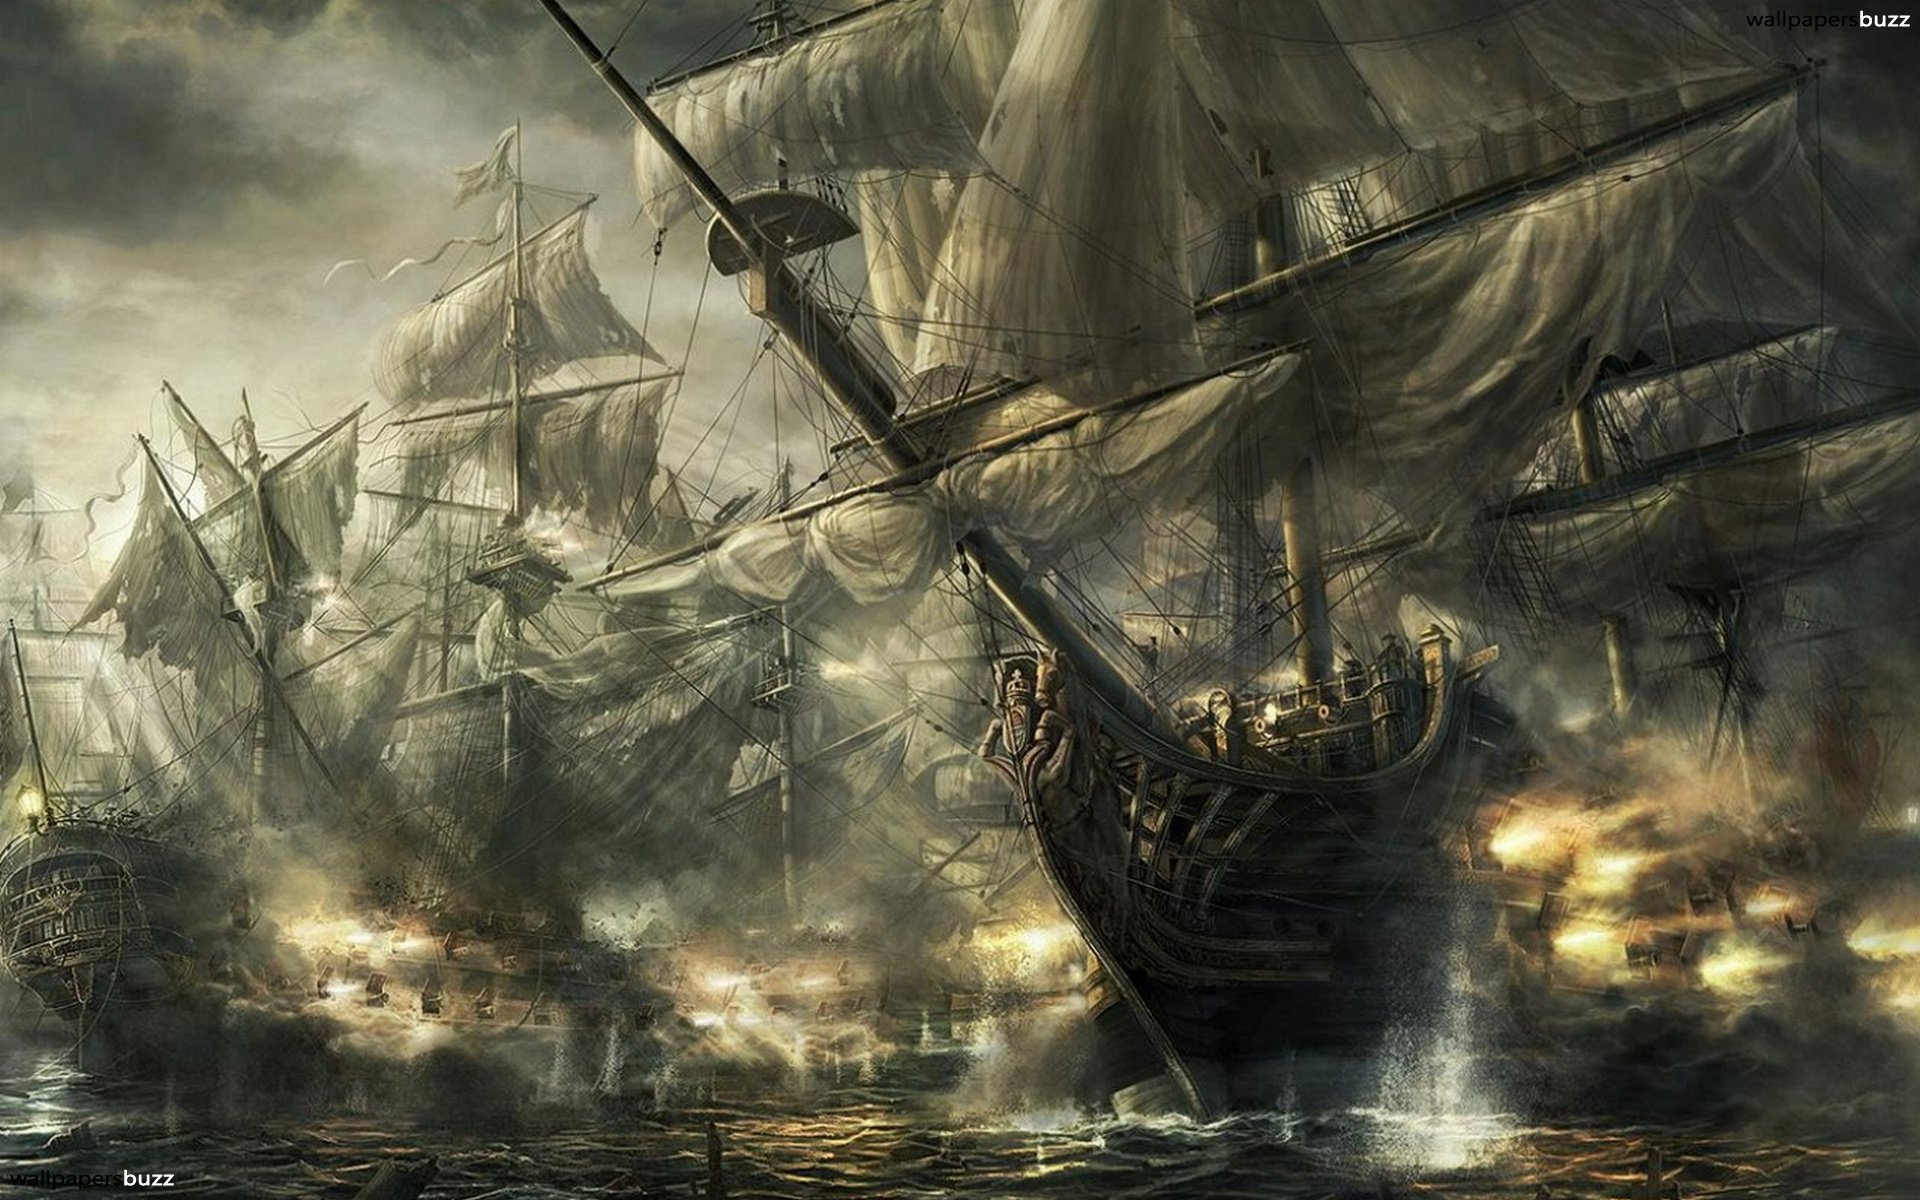 Amazing ship bay HD Wallpaper 1920x1200